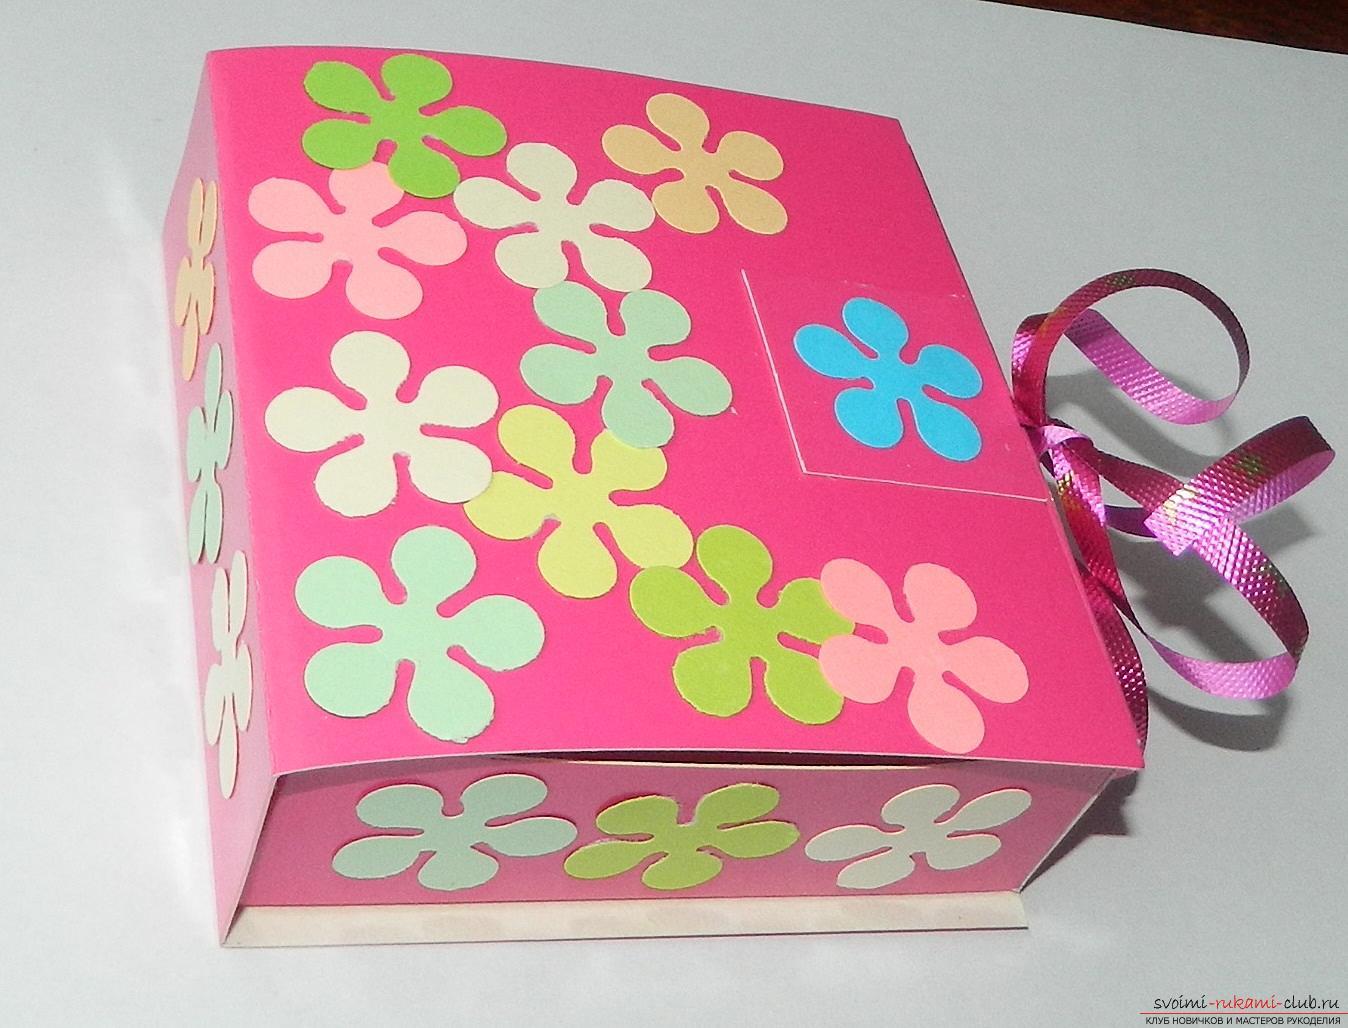 Как сделать подарочною коробку поэтапно